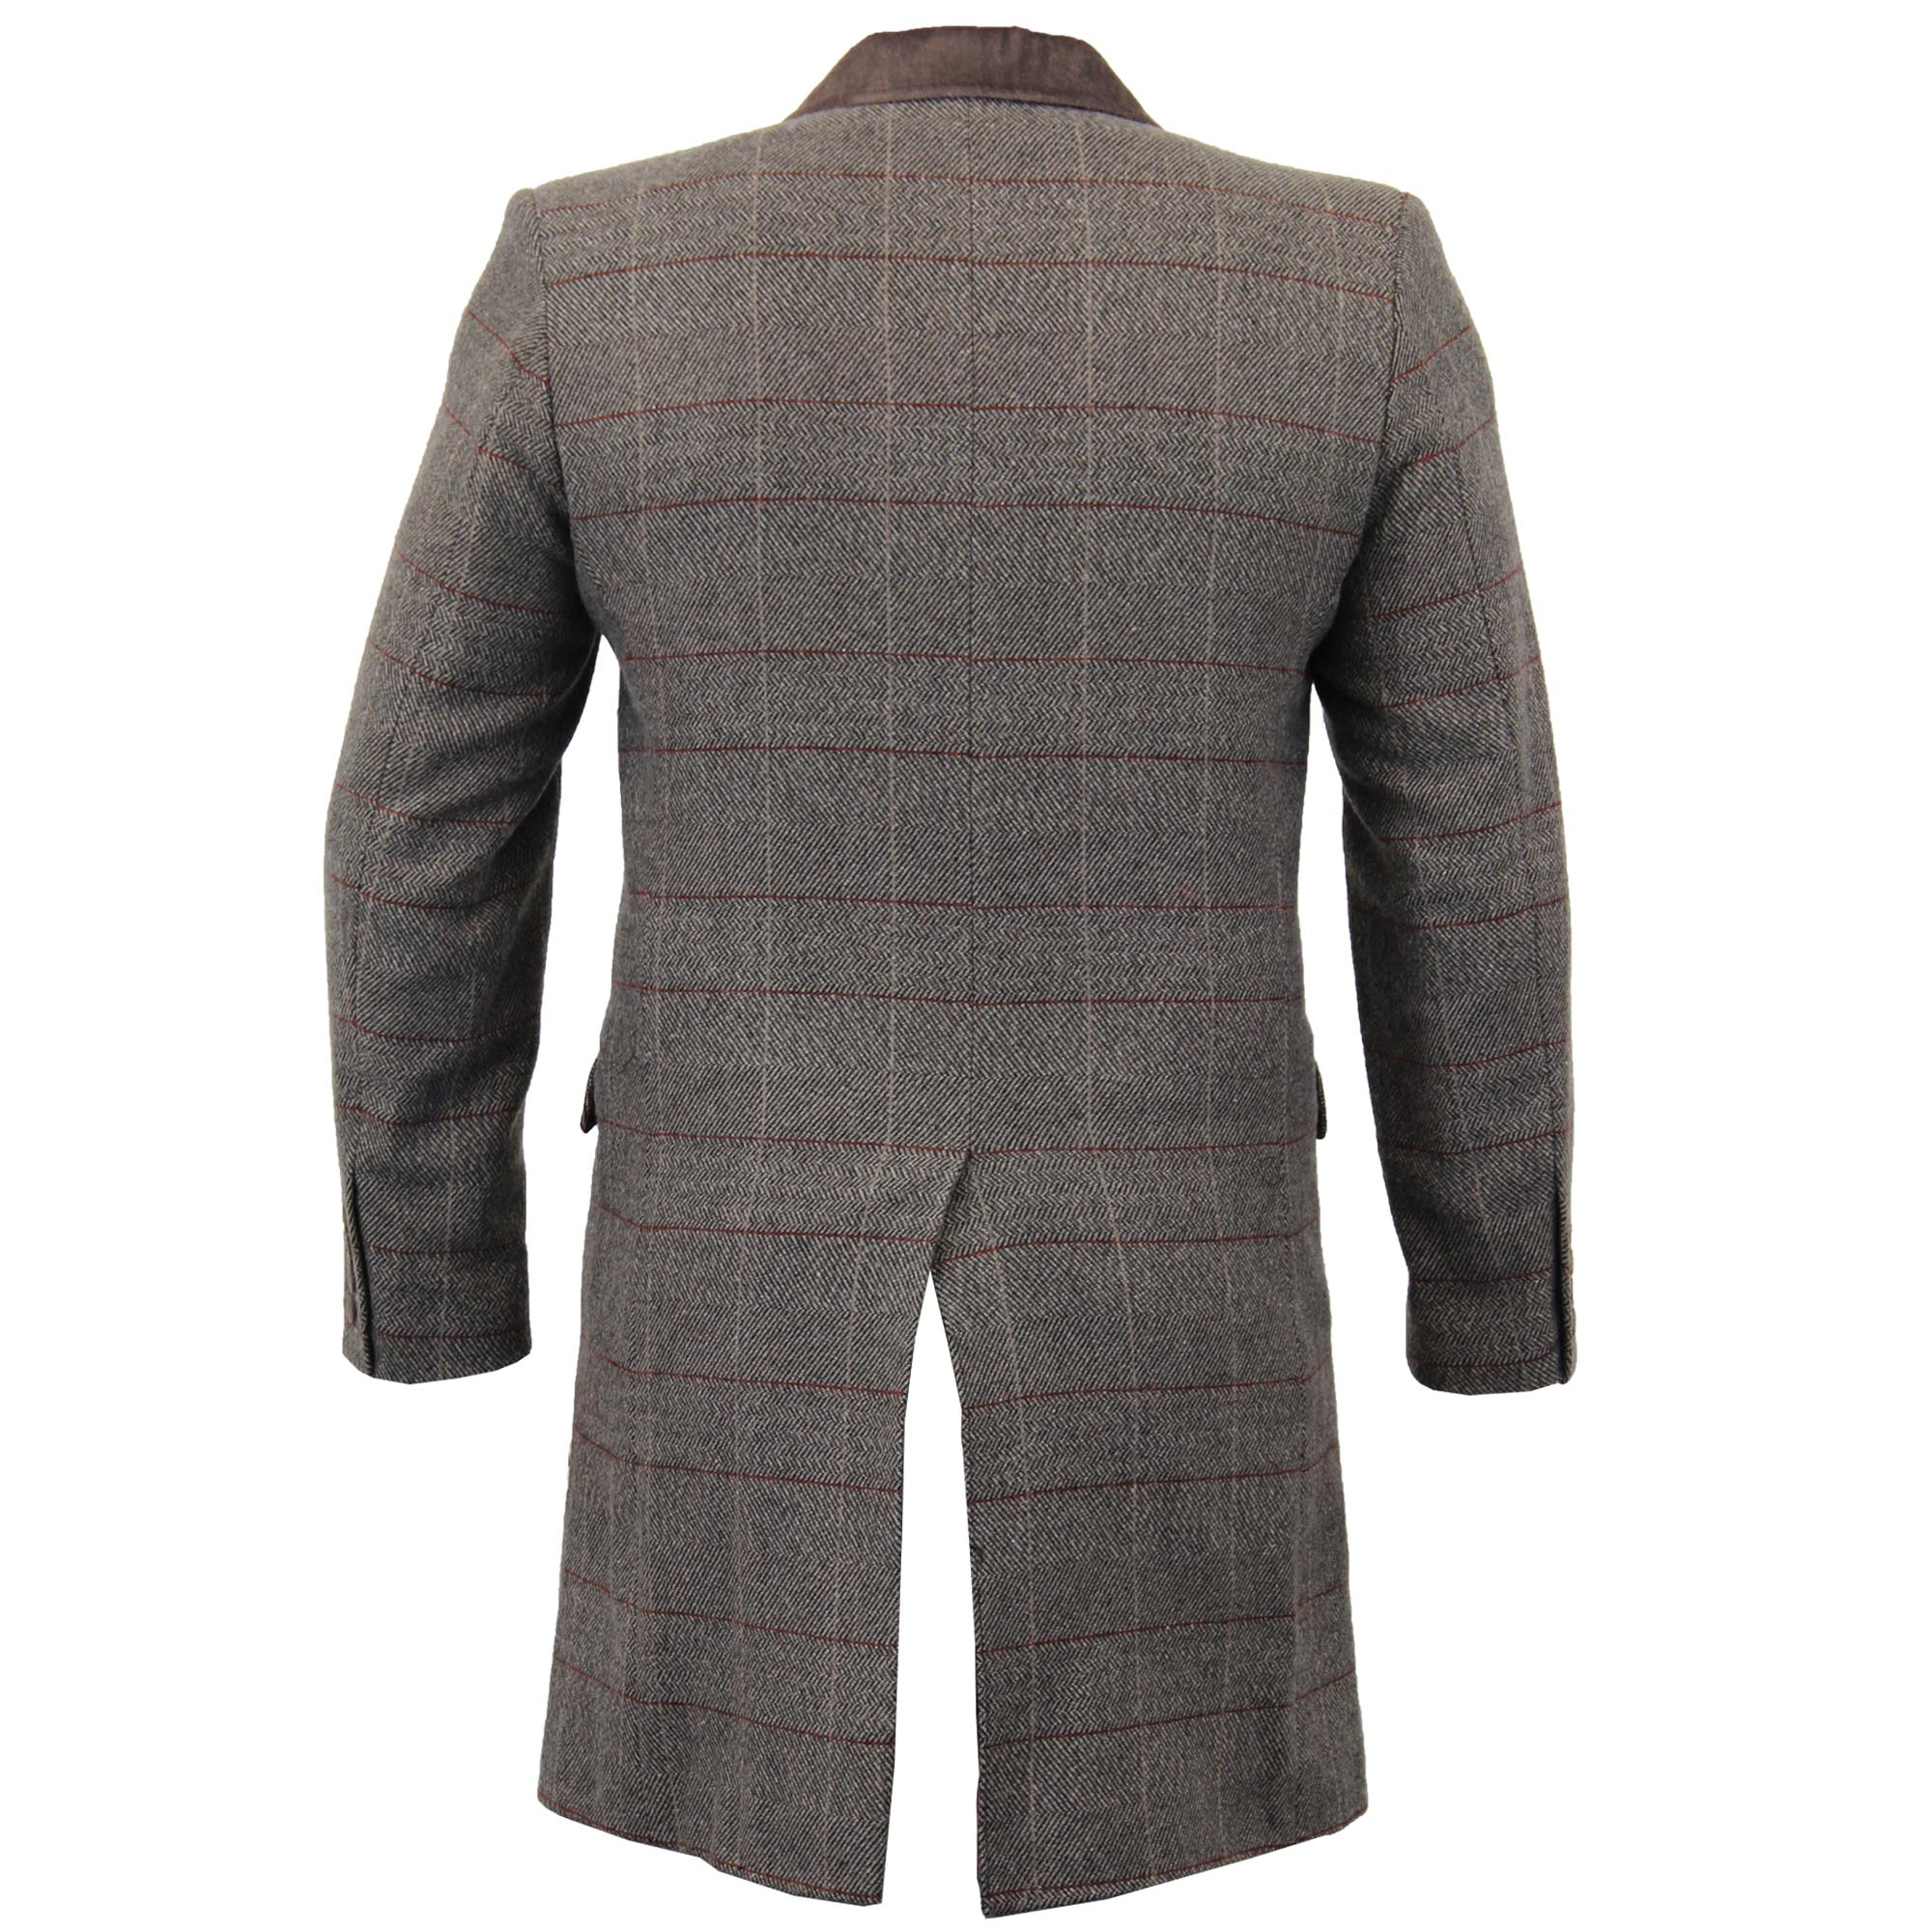 Mens-Wool-Mix-Trench-Coat-Checked-Jacket-Herringbone-Tweed-Overcoat-Lined-Winter thumbnail 7